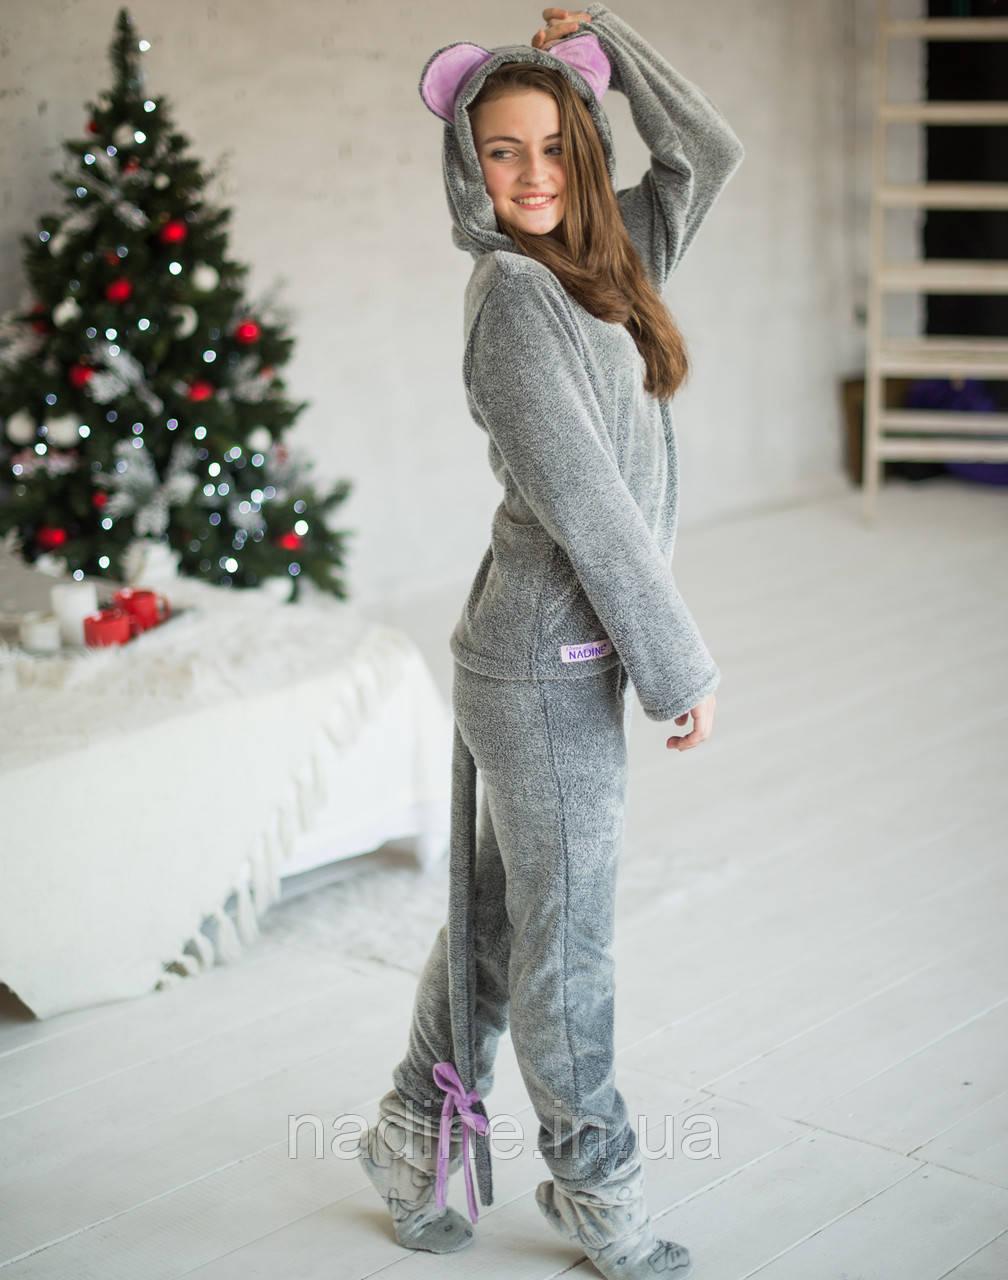 Подростковая пижама кигурами Мышка Eirena Nadine (723-46) на рост 146 серая